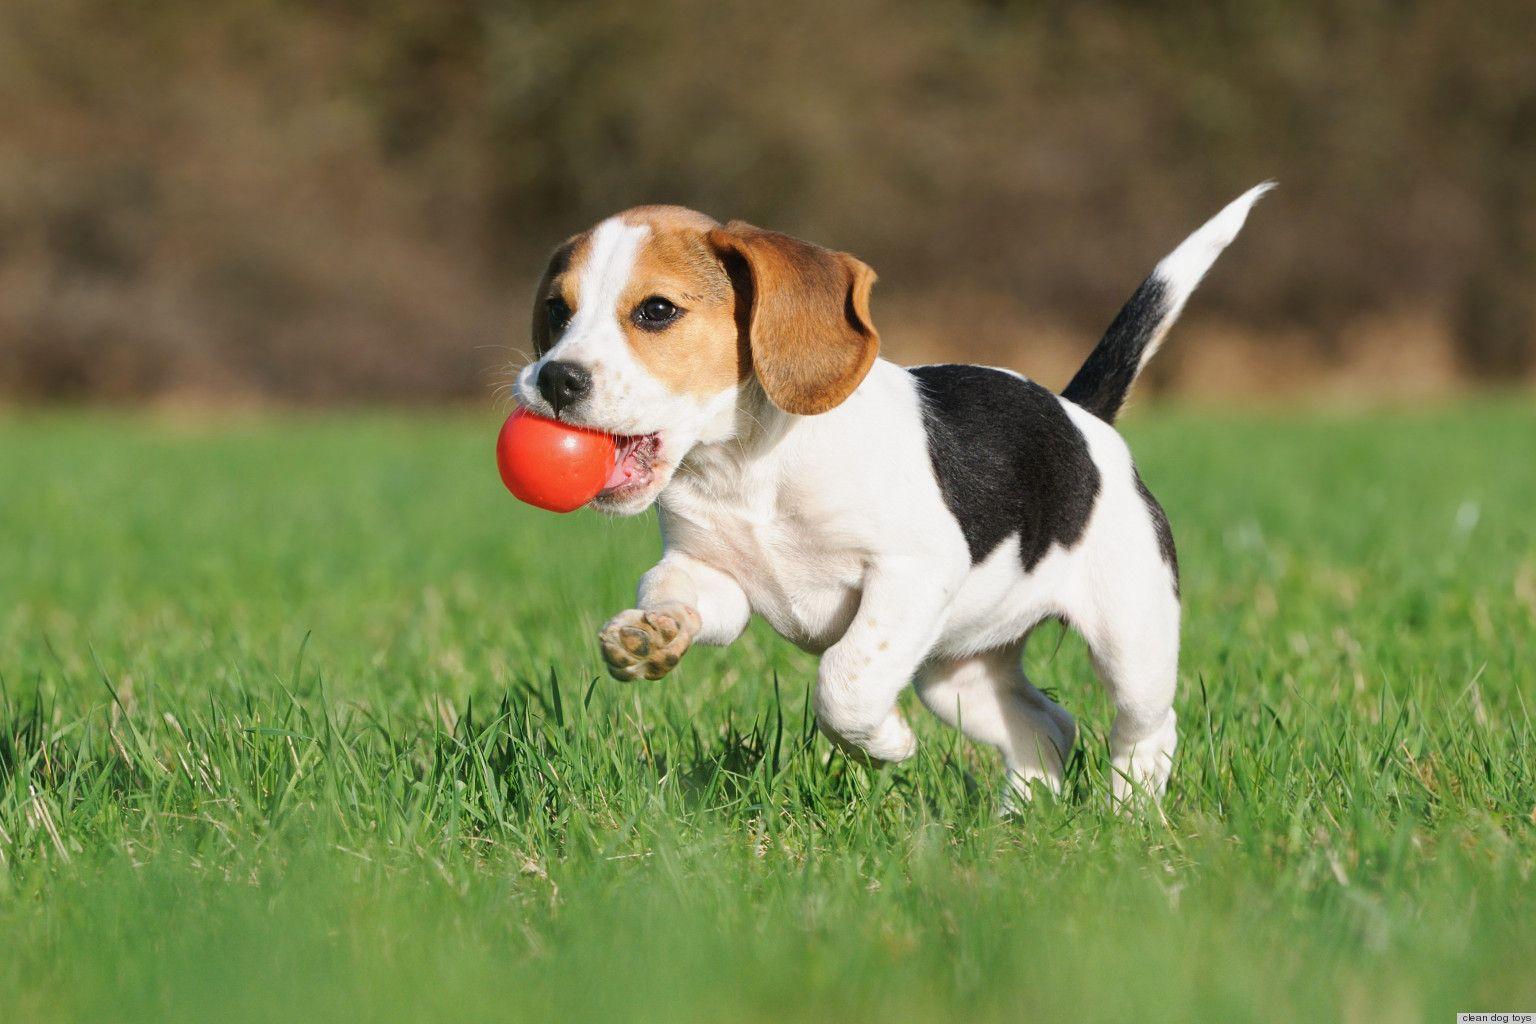 Beagle Puppy Playing Beagle Puppy Stinky Dog Puppy Training